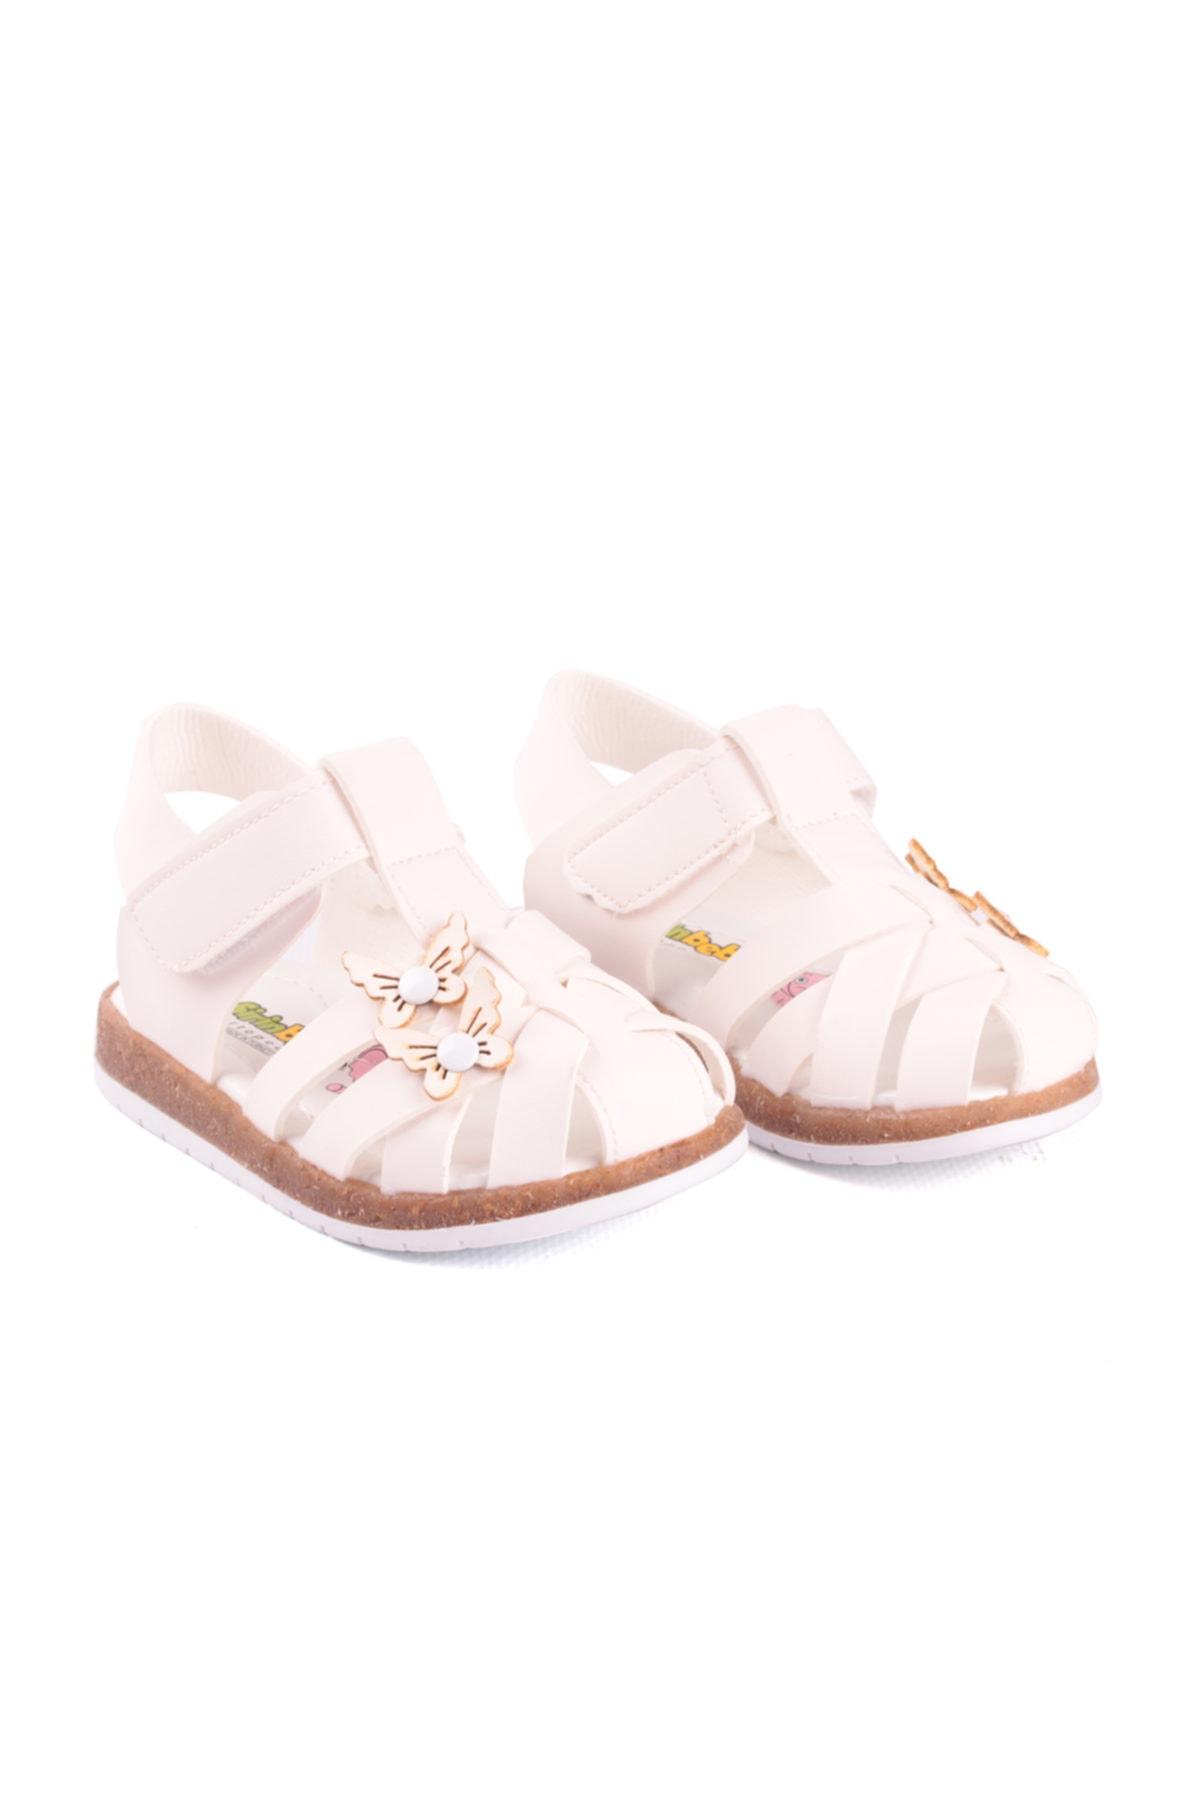 Flaneur Baby Girl Orthopedic Closed Toe Sandals 2021 Premium Quality